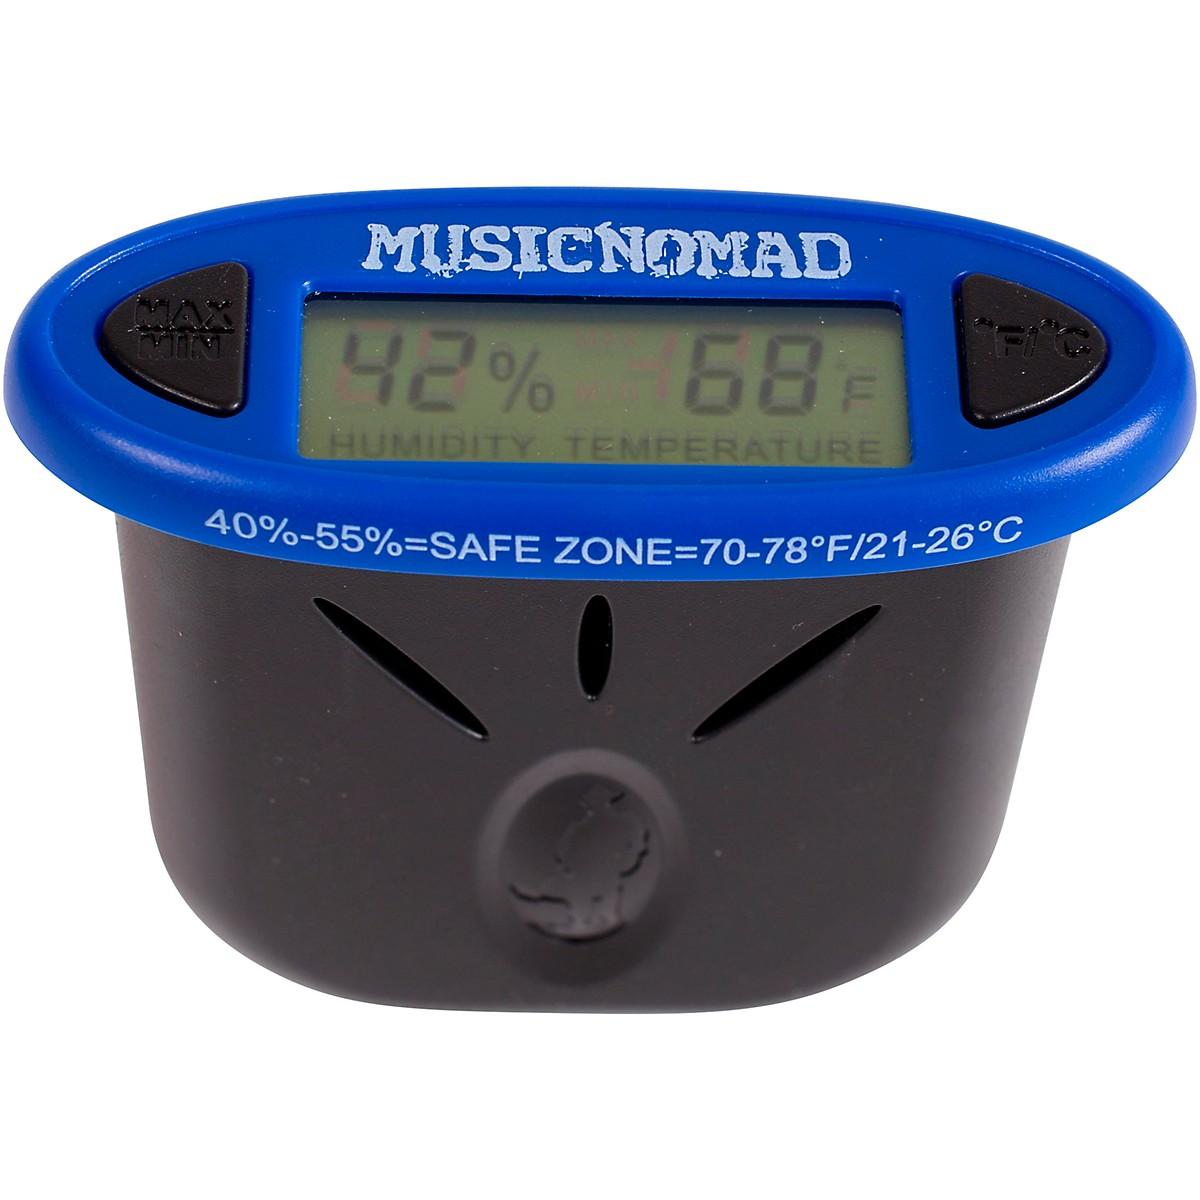 MusicNomad HumiReader - Humidity & Temperature Monitor 3 in 1